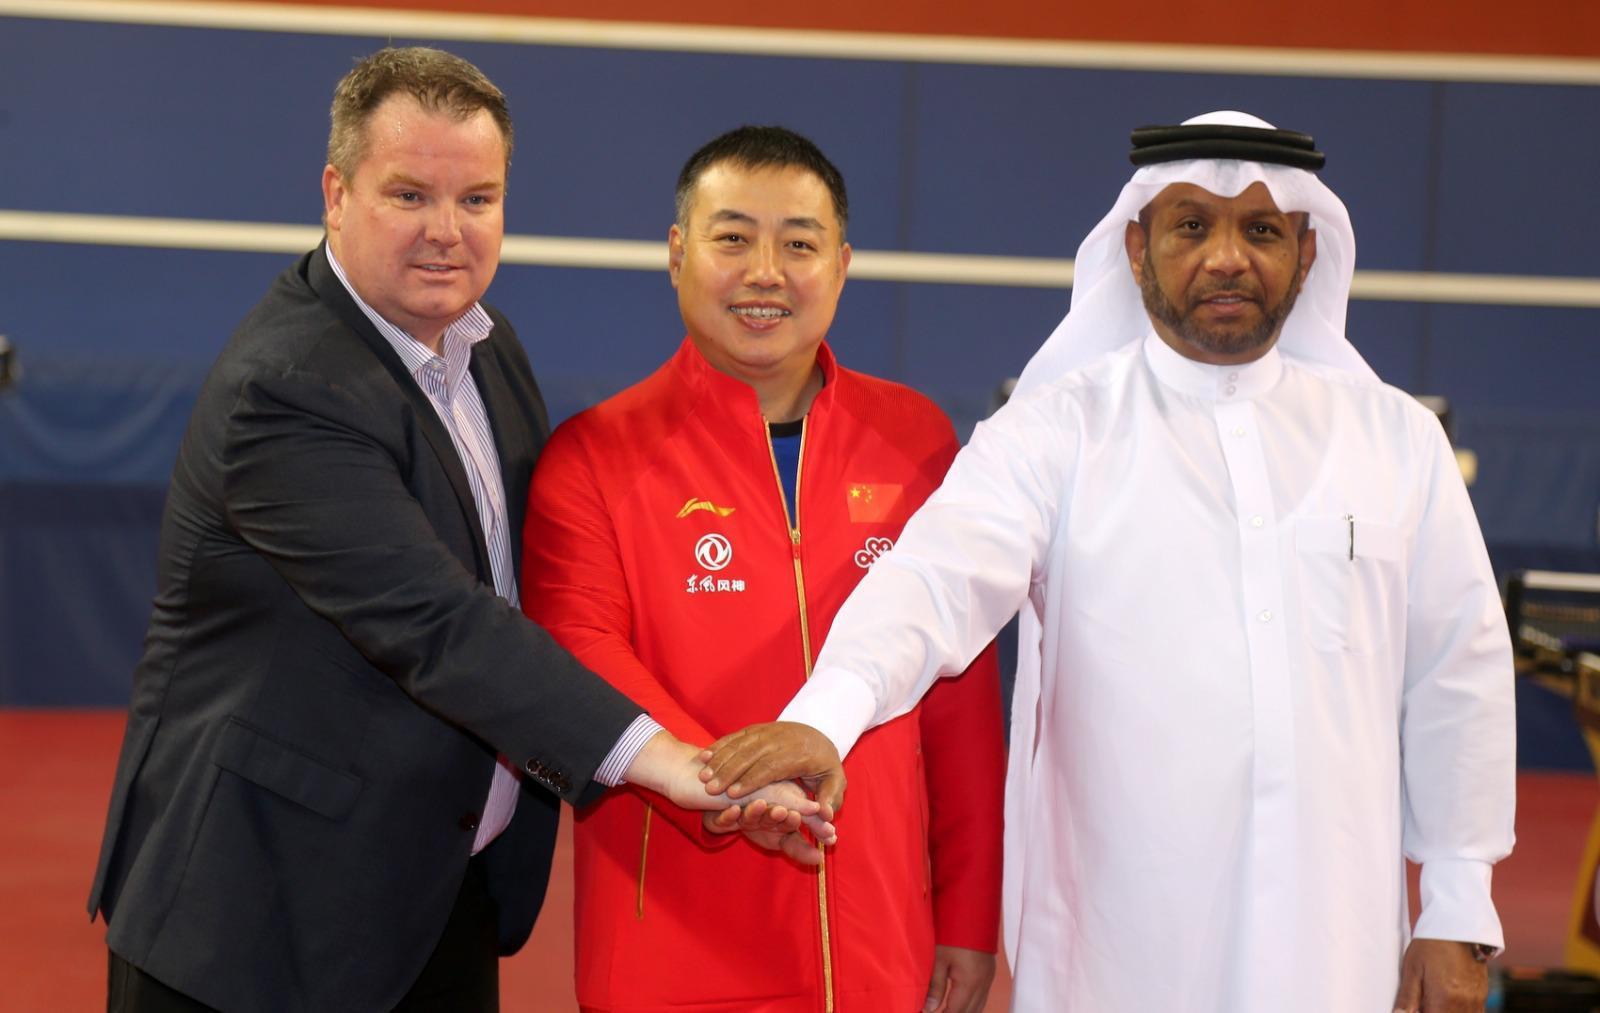 ITTF chief, Steve Dainton; CTTA President, Liu Guoliang and QTTA President and ITTF Deputy President, Khalil Al-Mohannadi all unite to support affected Chinese table tennis players ©ITTF